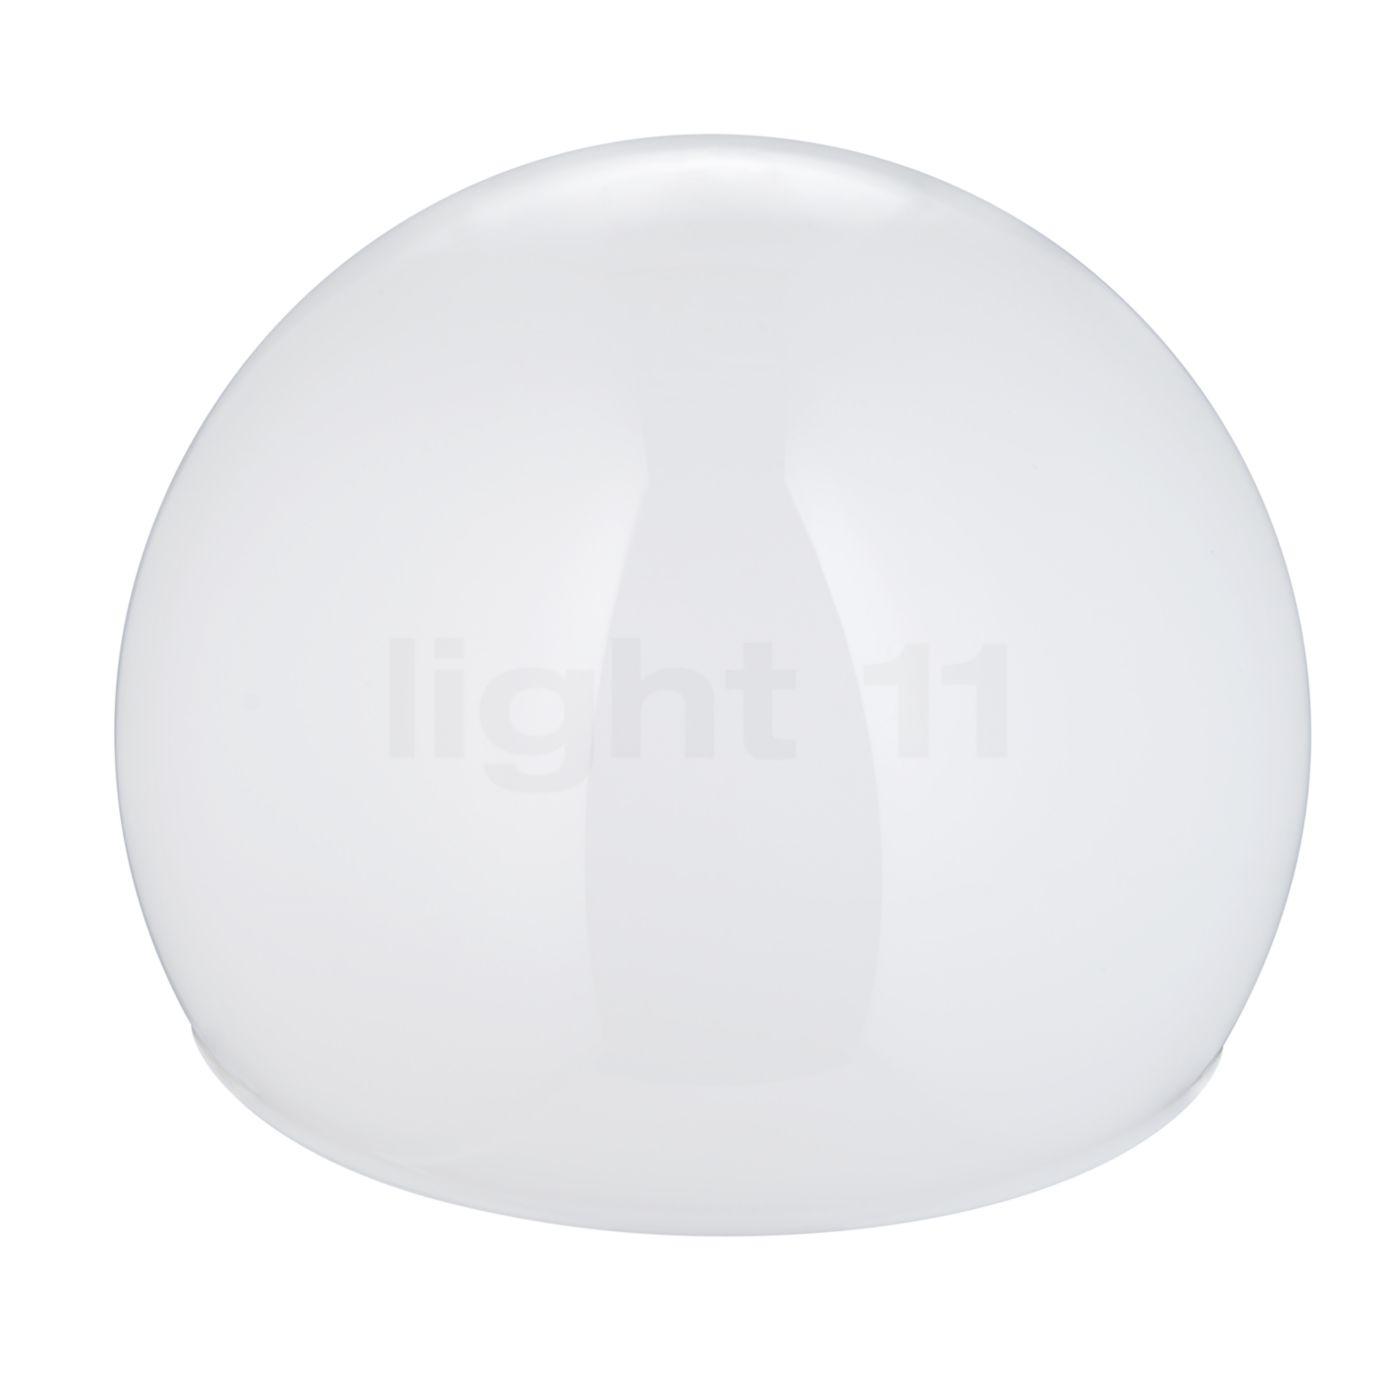 Tecnolumen Globe pour Lampes Wagenfeld, Pièce de rechange, opale